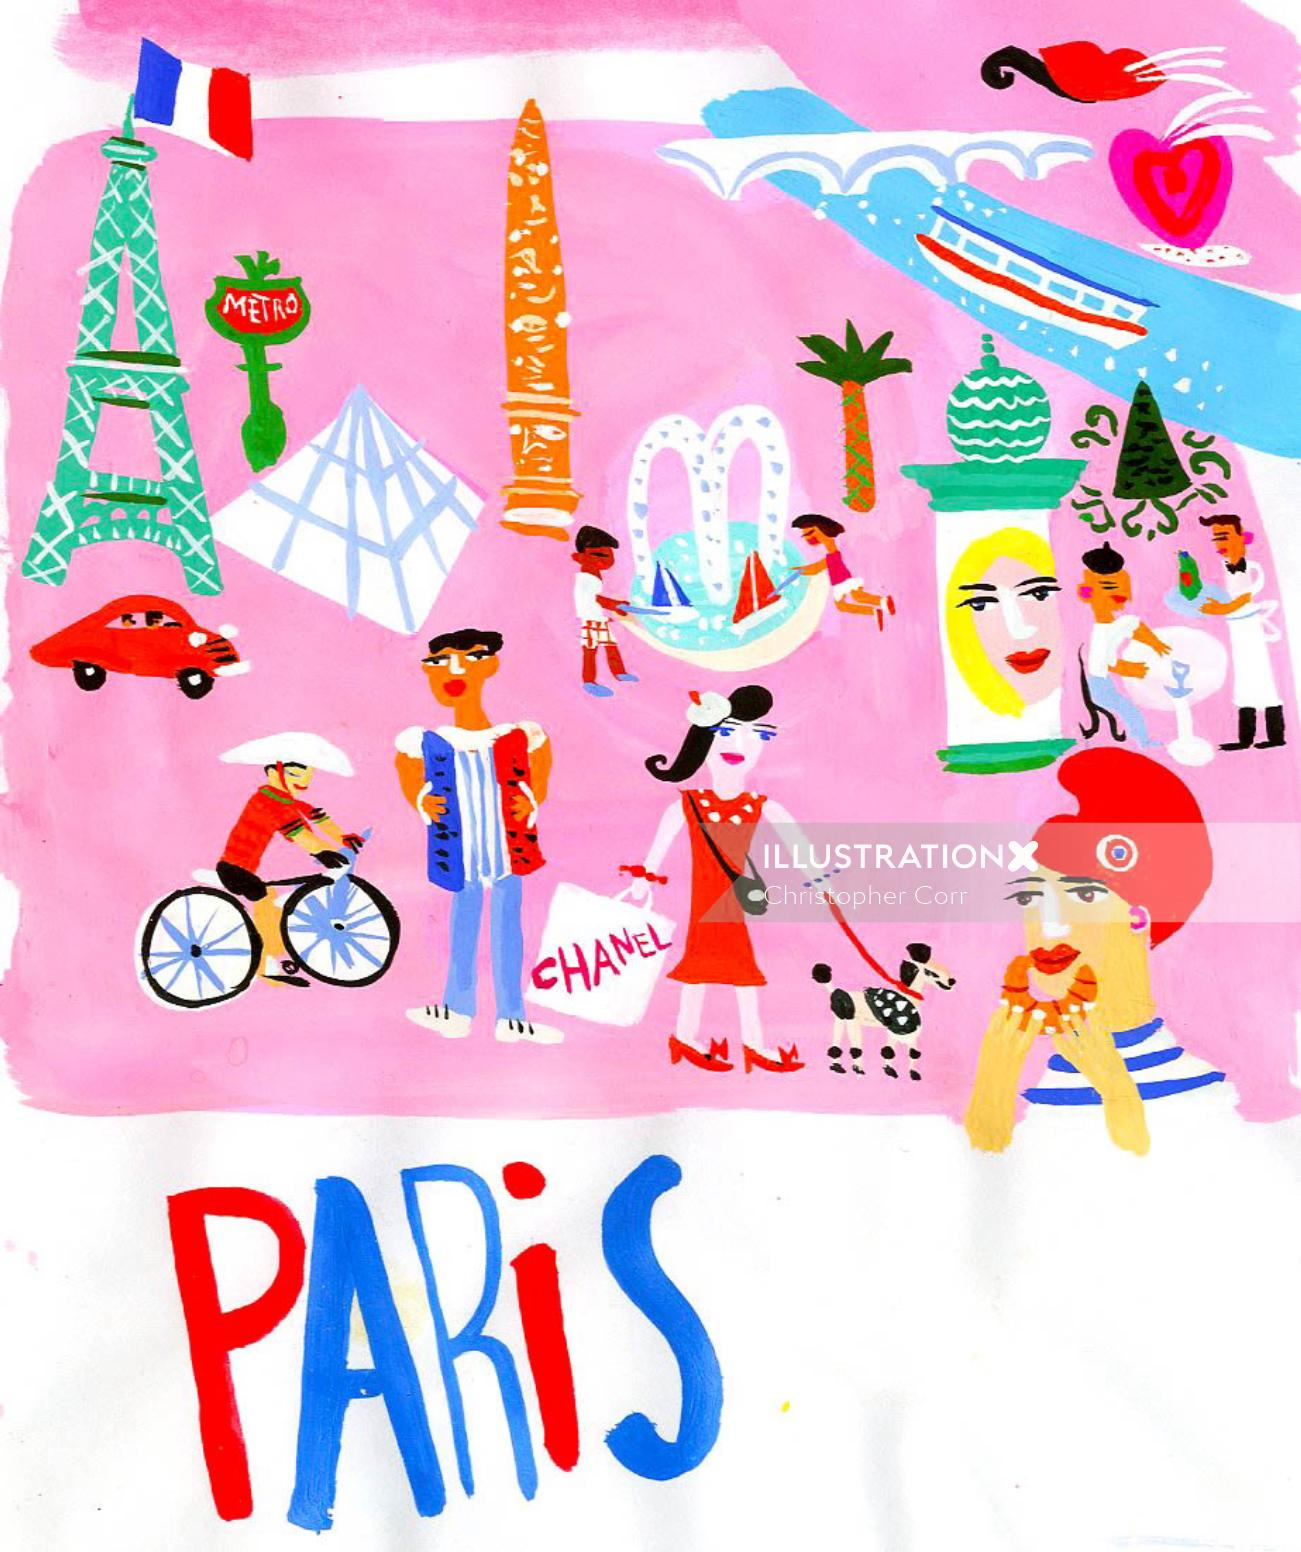 Paris illustration by Christopher Corr